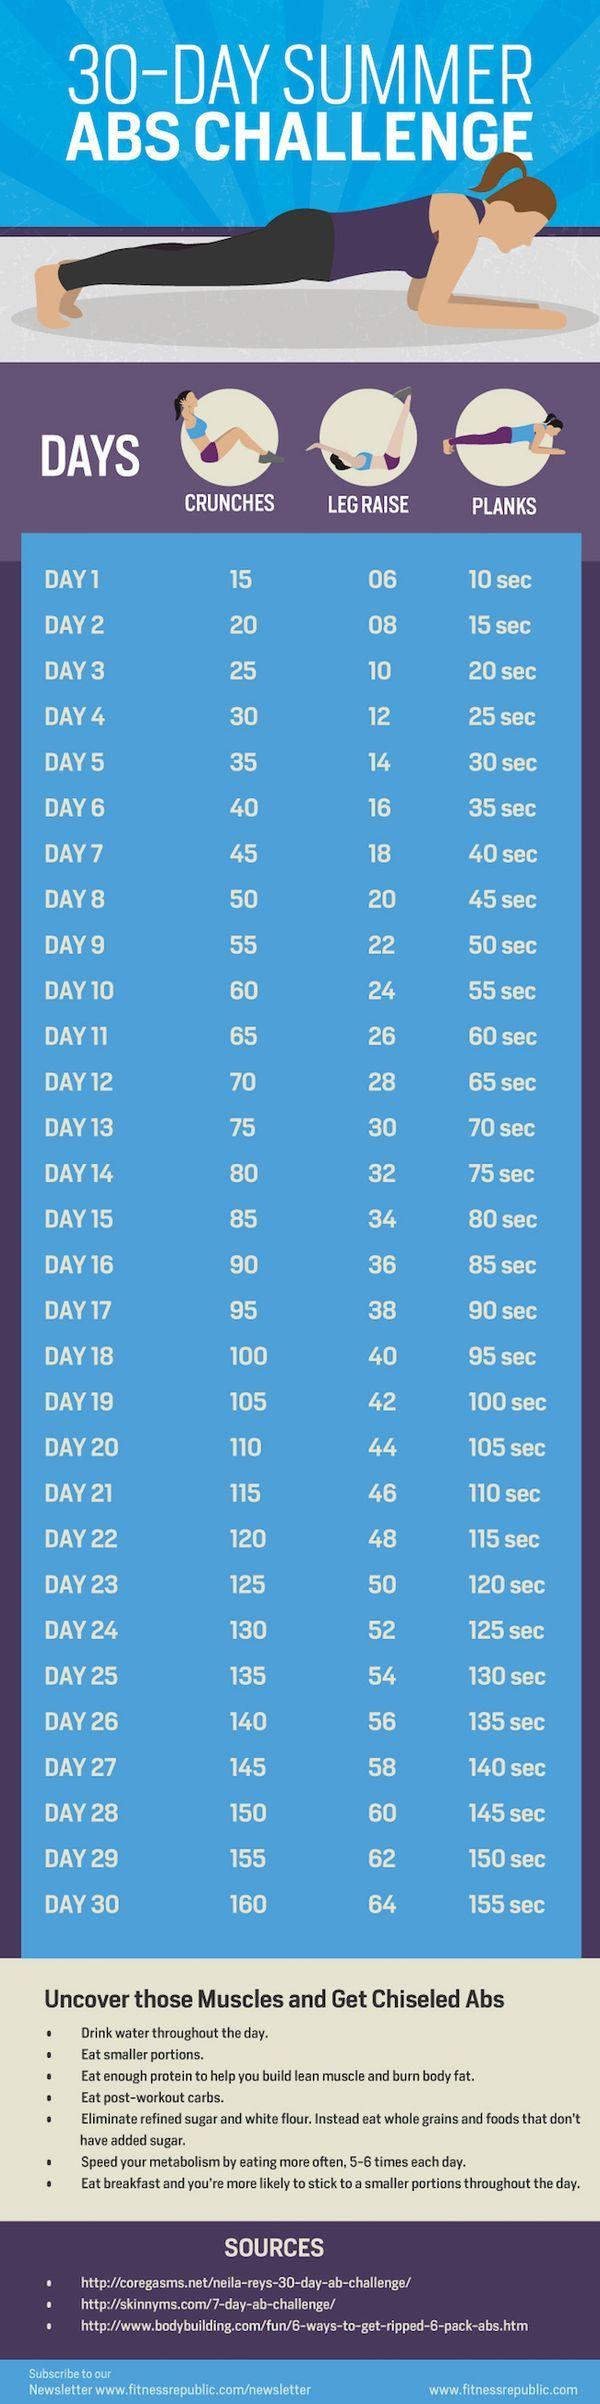 Treadmill help lose stomach fat